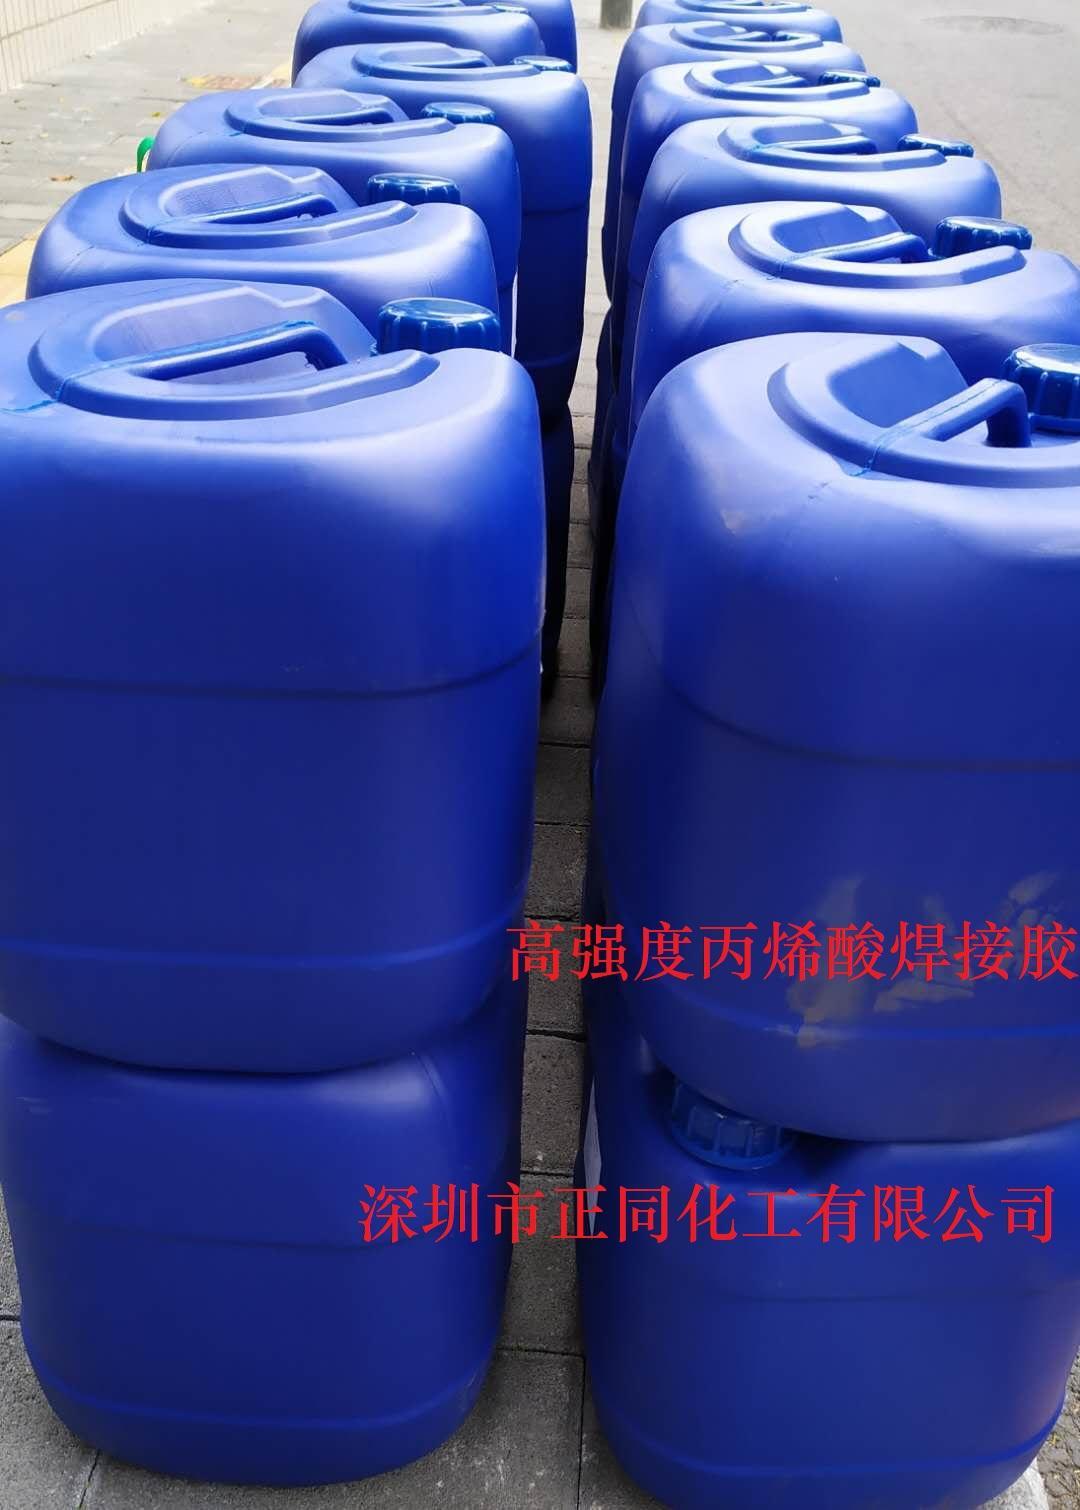 AB-303双组份丙烯酸胶粘剂 1